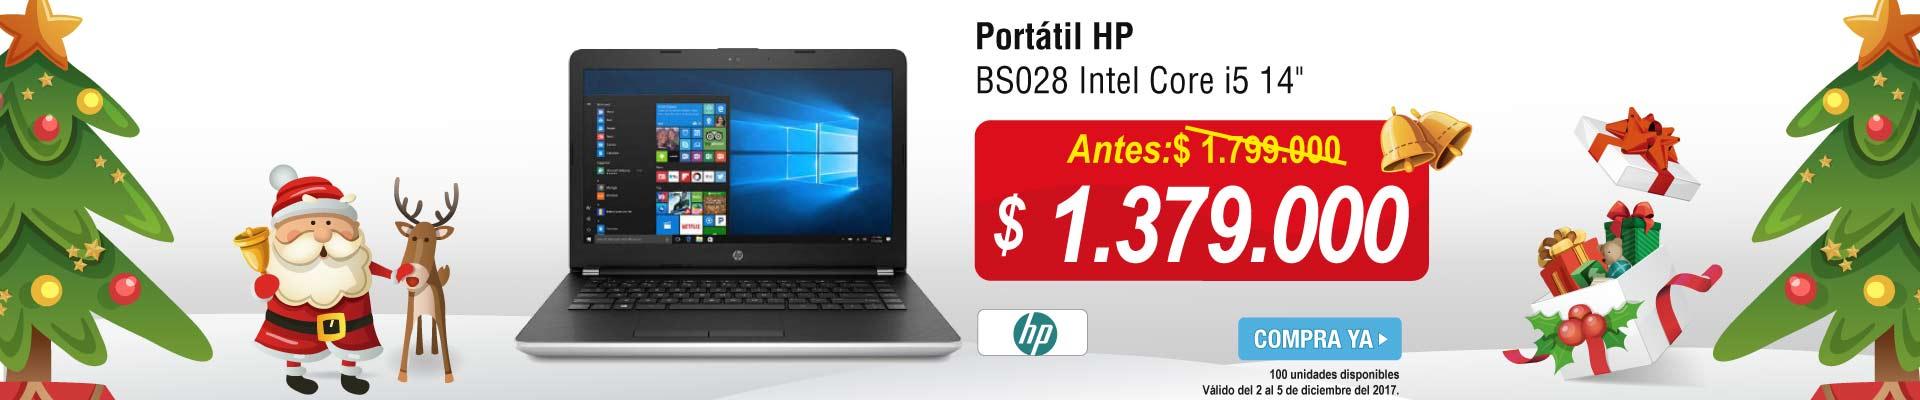 Portátil HP BS007 Celeron 14 -banner principal